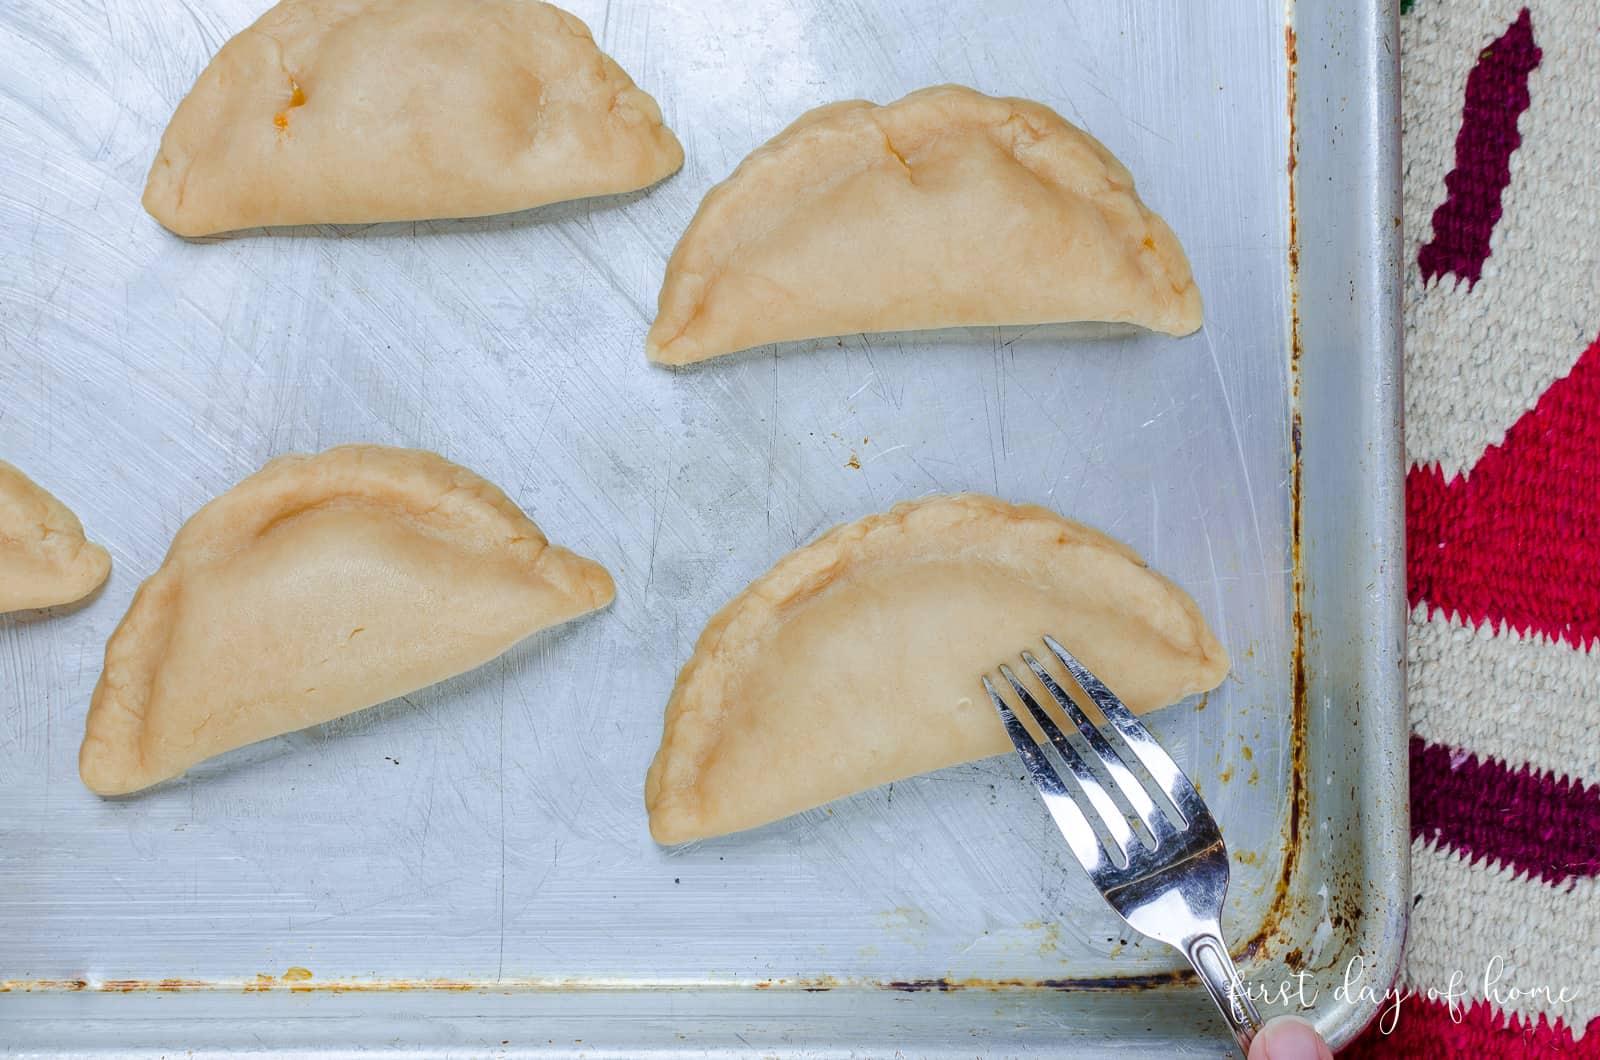 Poking holes in pumpkin empanada dough to create vent holes while baking